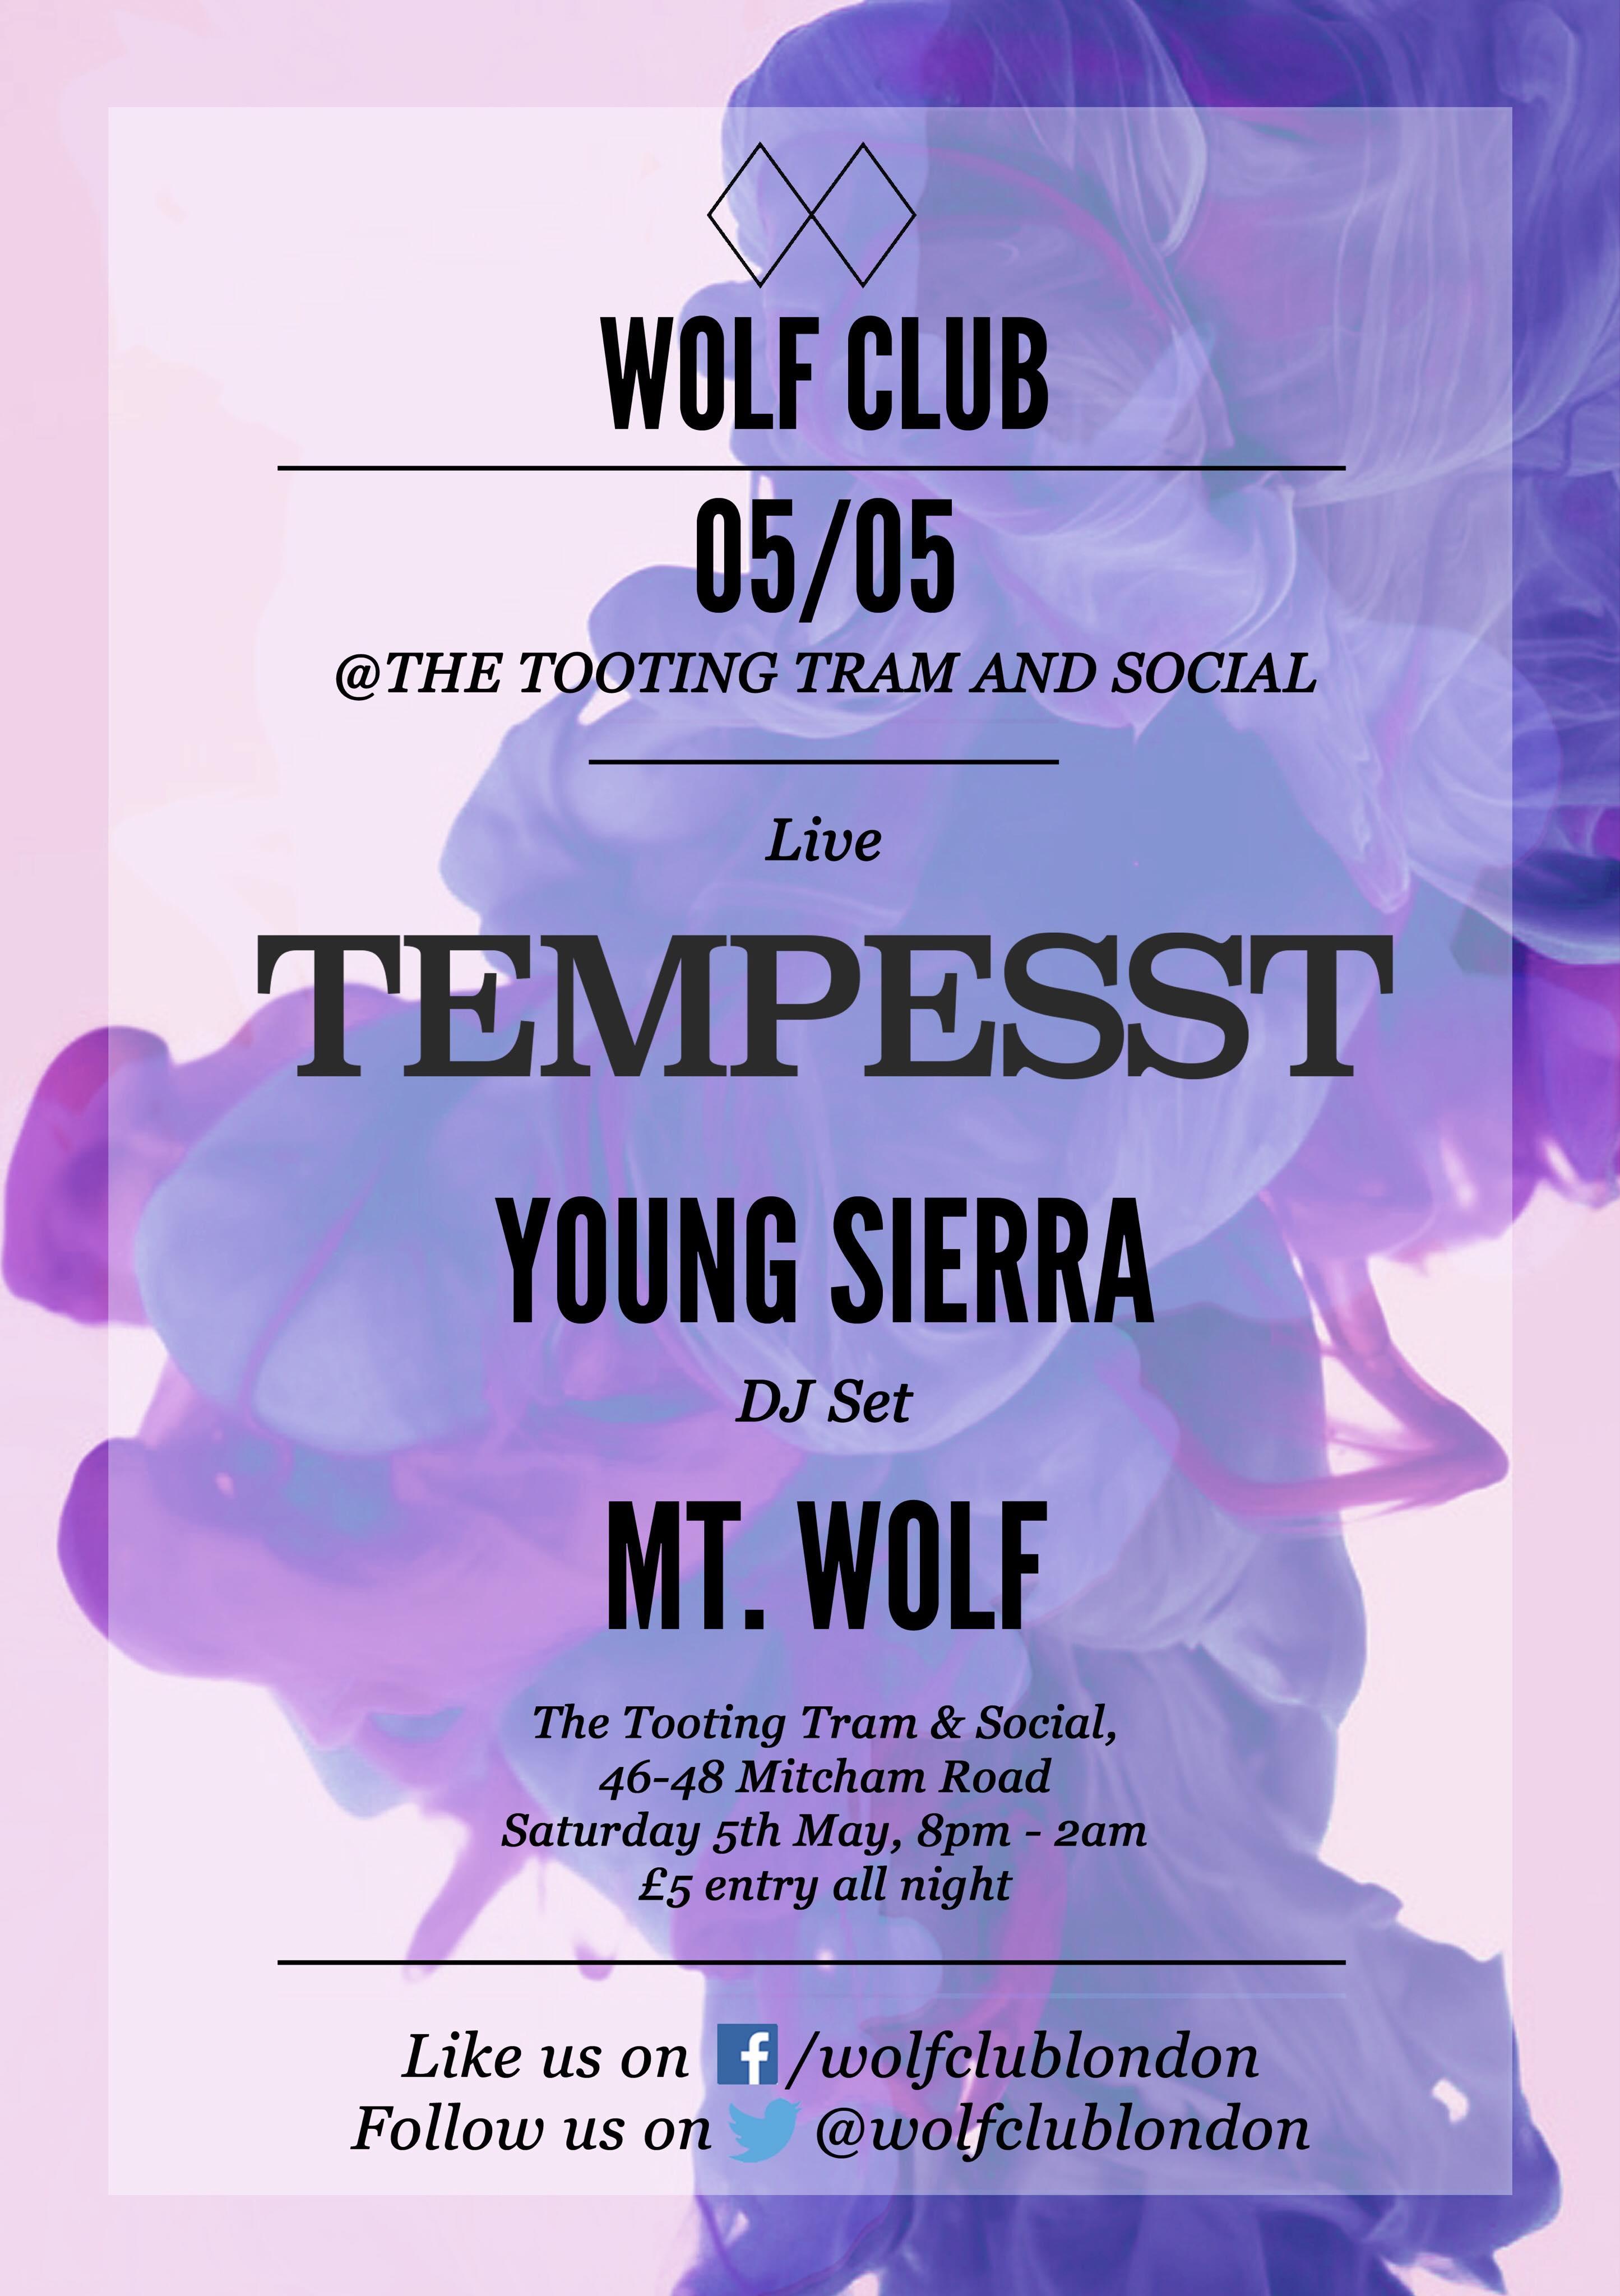 WOLF CLUB: Tempesst, Young Sierra / MT WOLF DJ Set